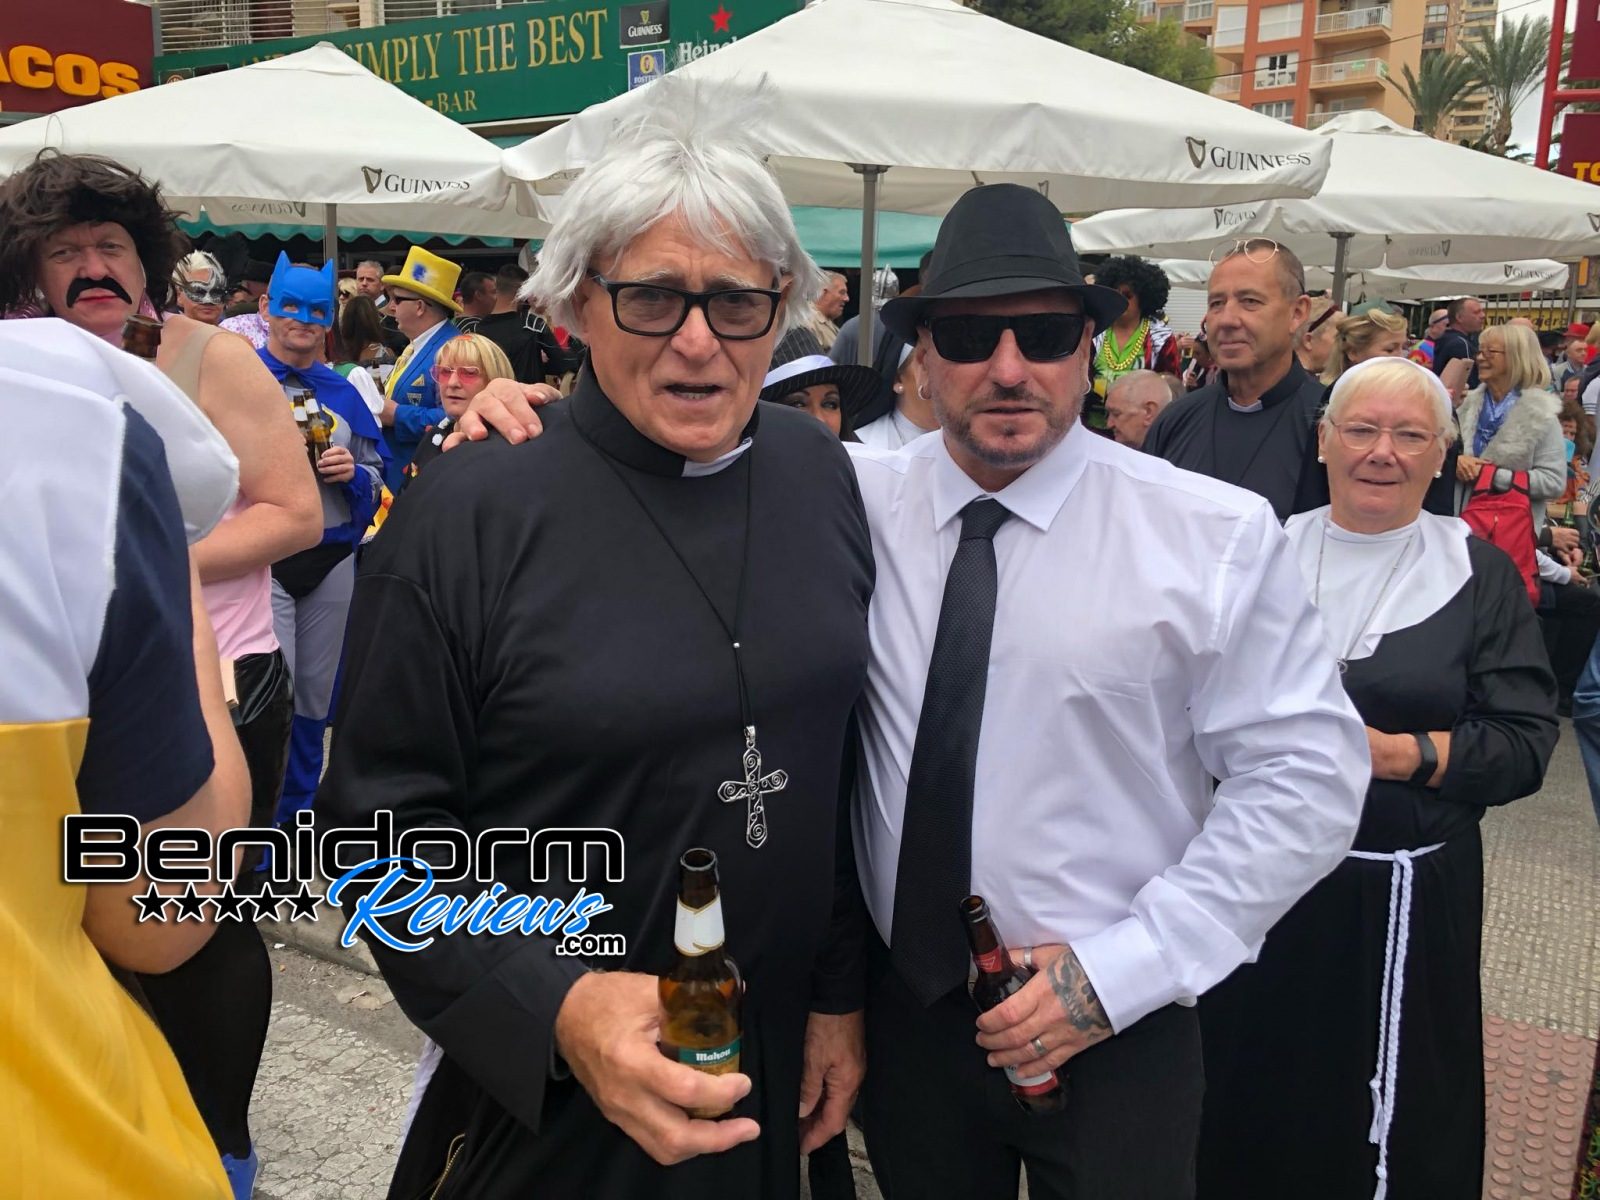 Benidorm-Fiestas-2019-Fancy-Dress-197